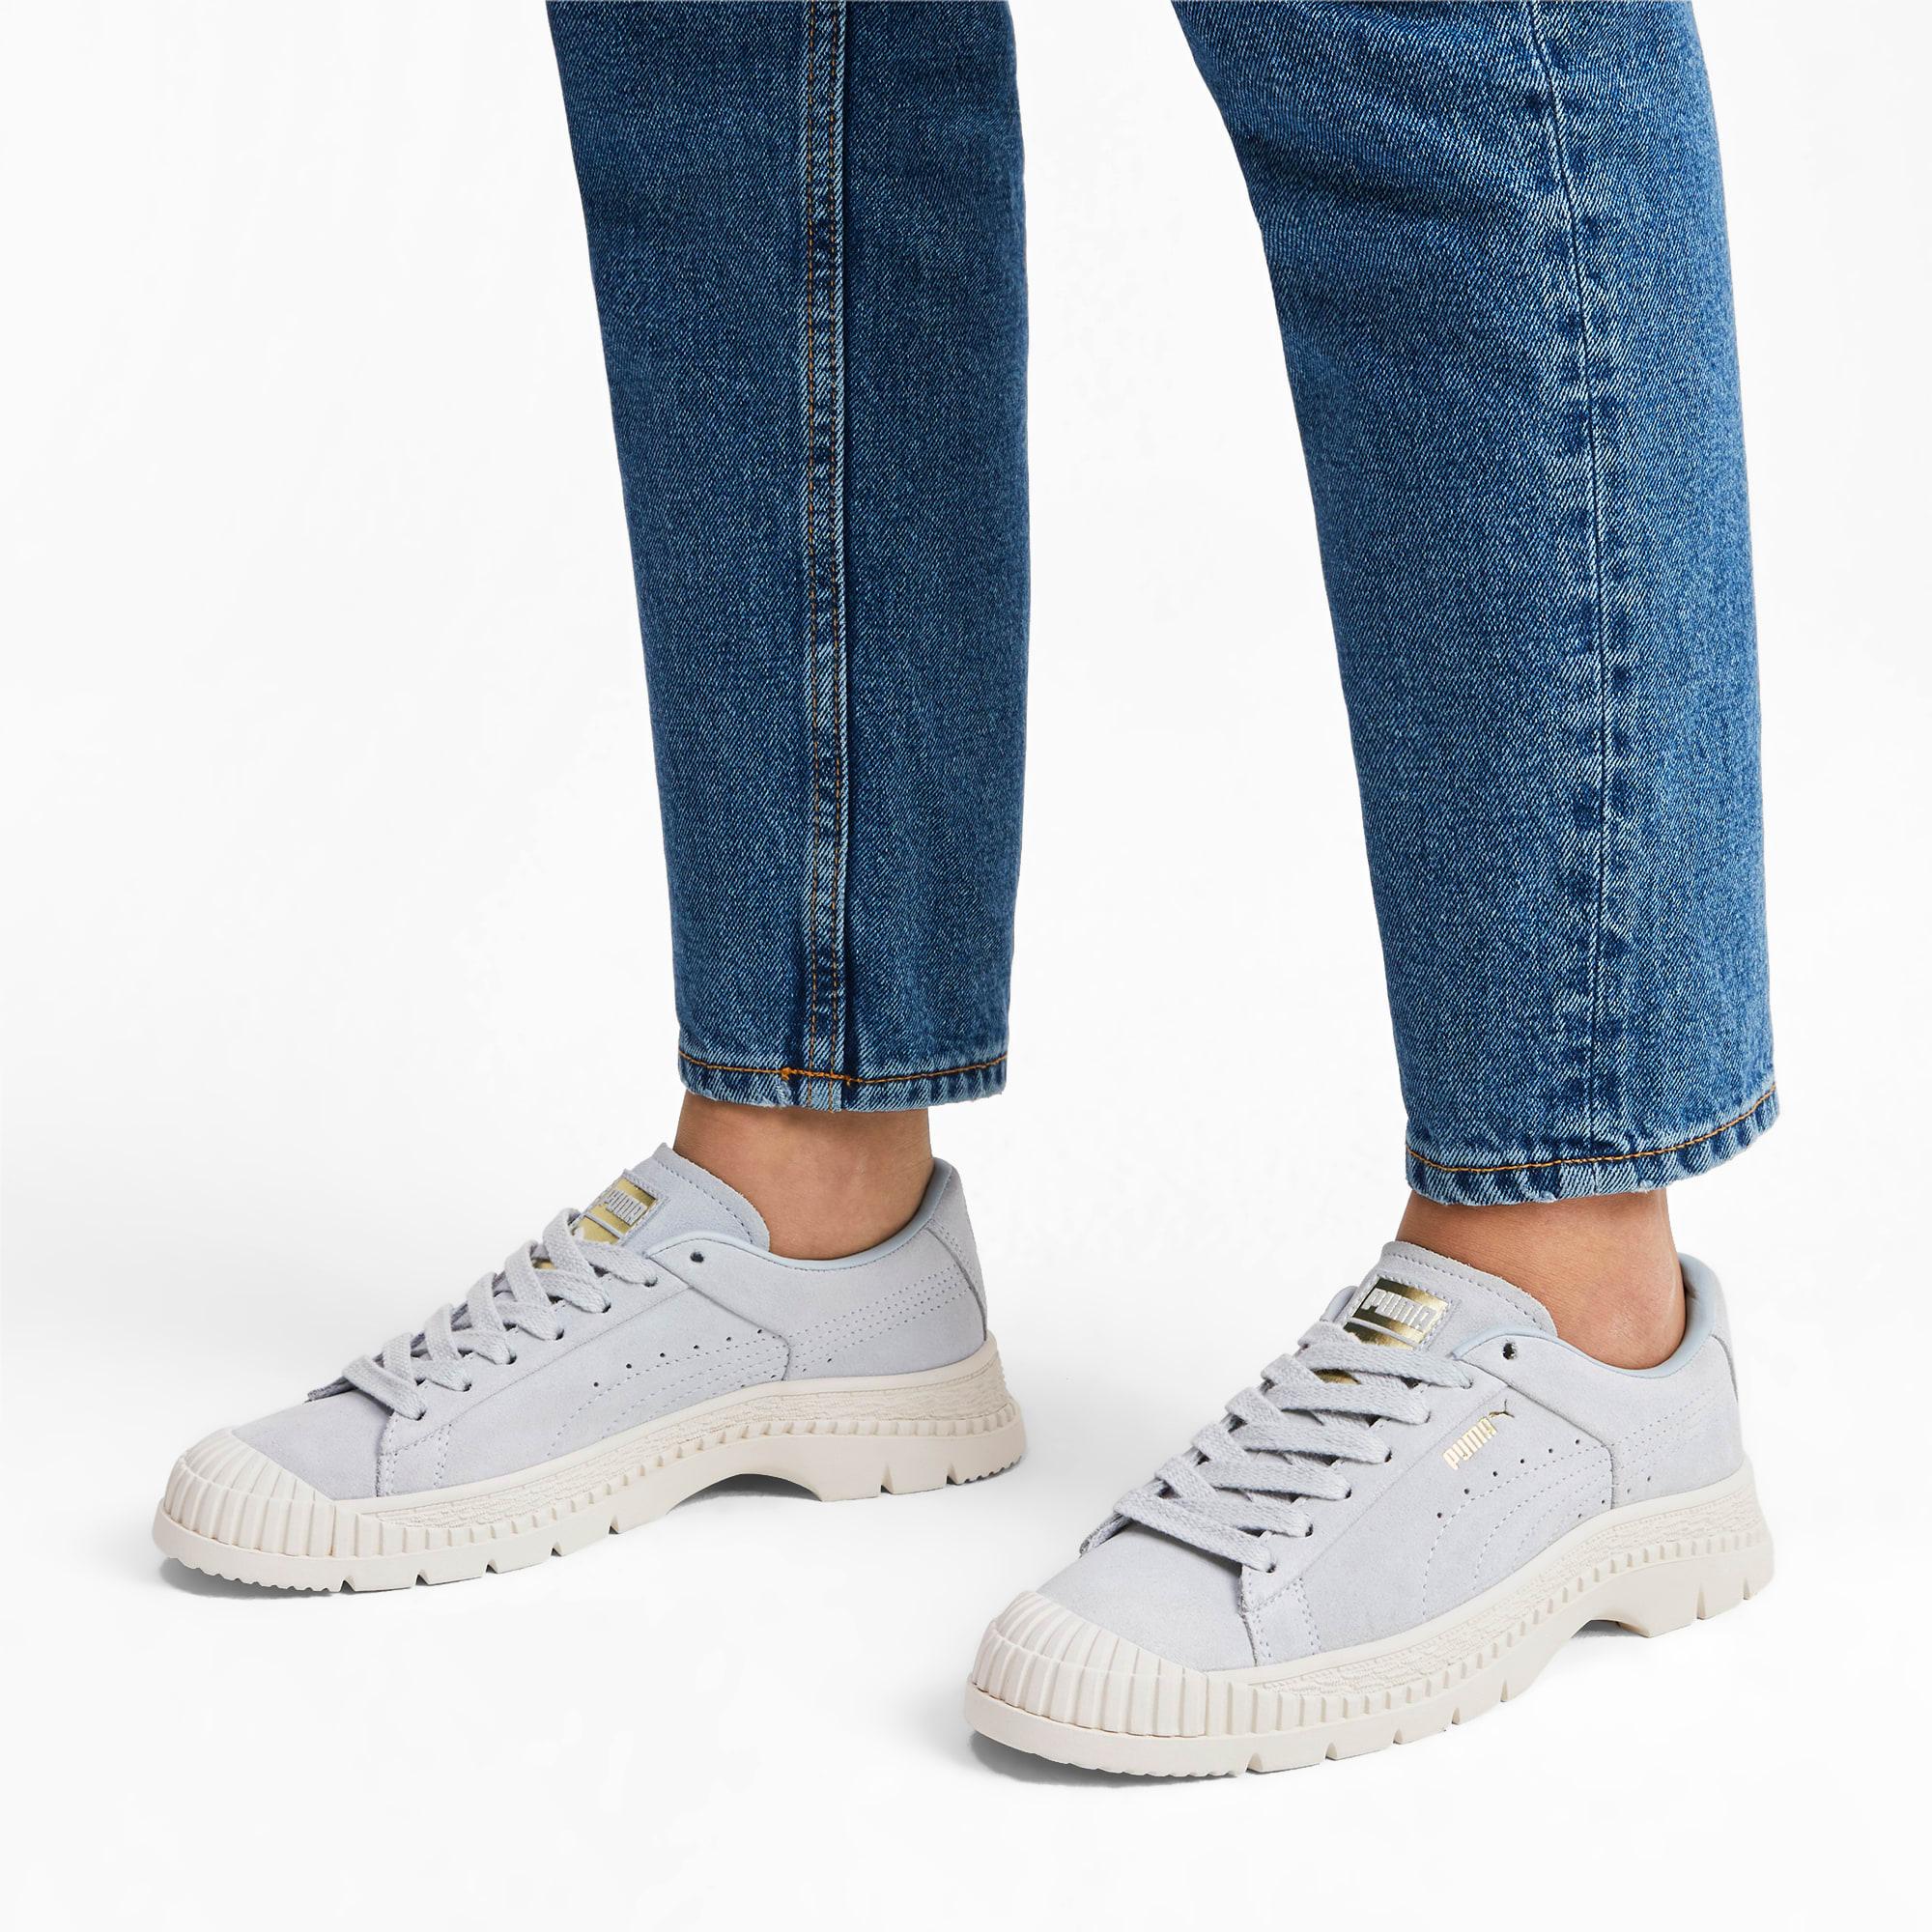 Utility Suede Women's Sneakers   PUMA US